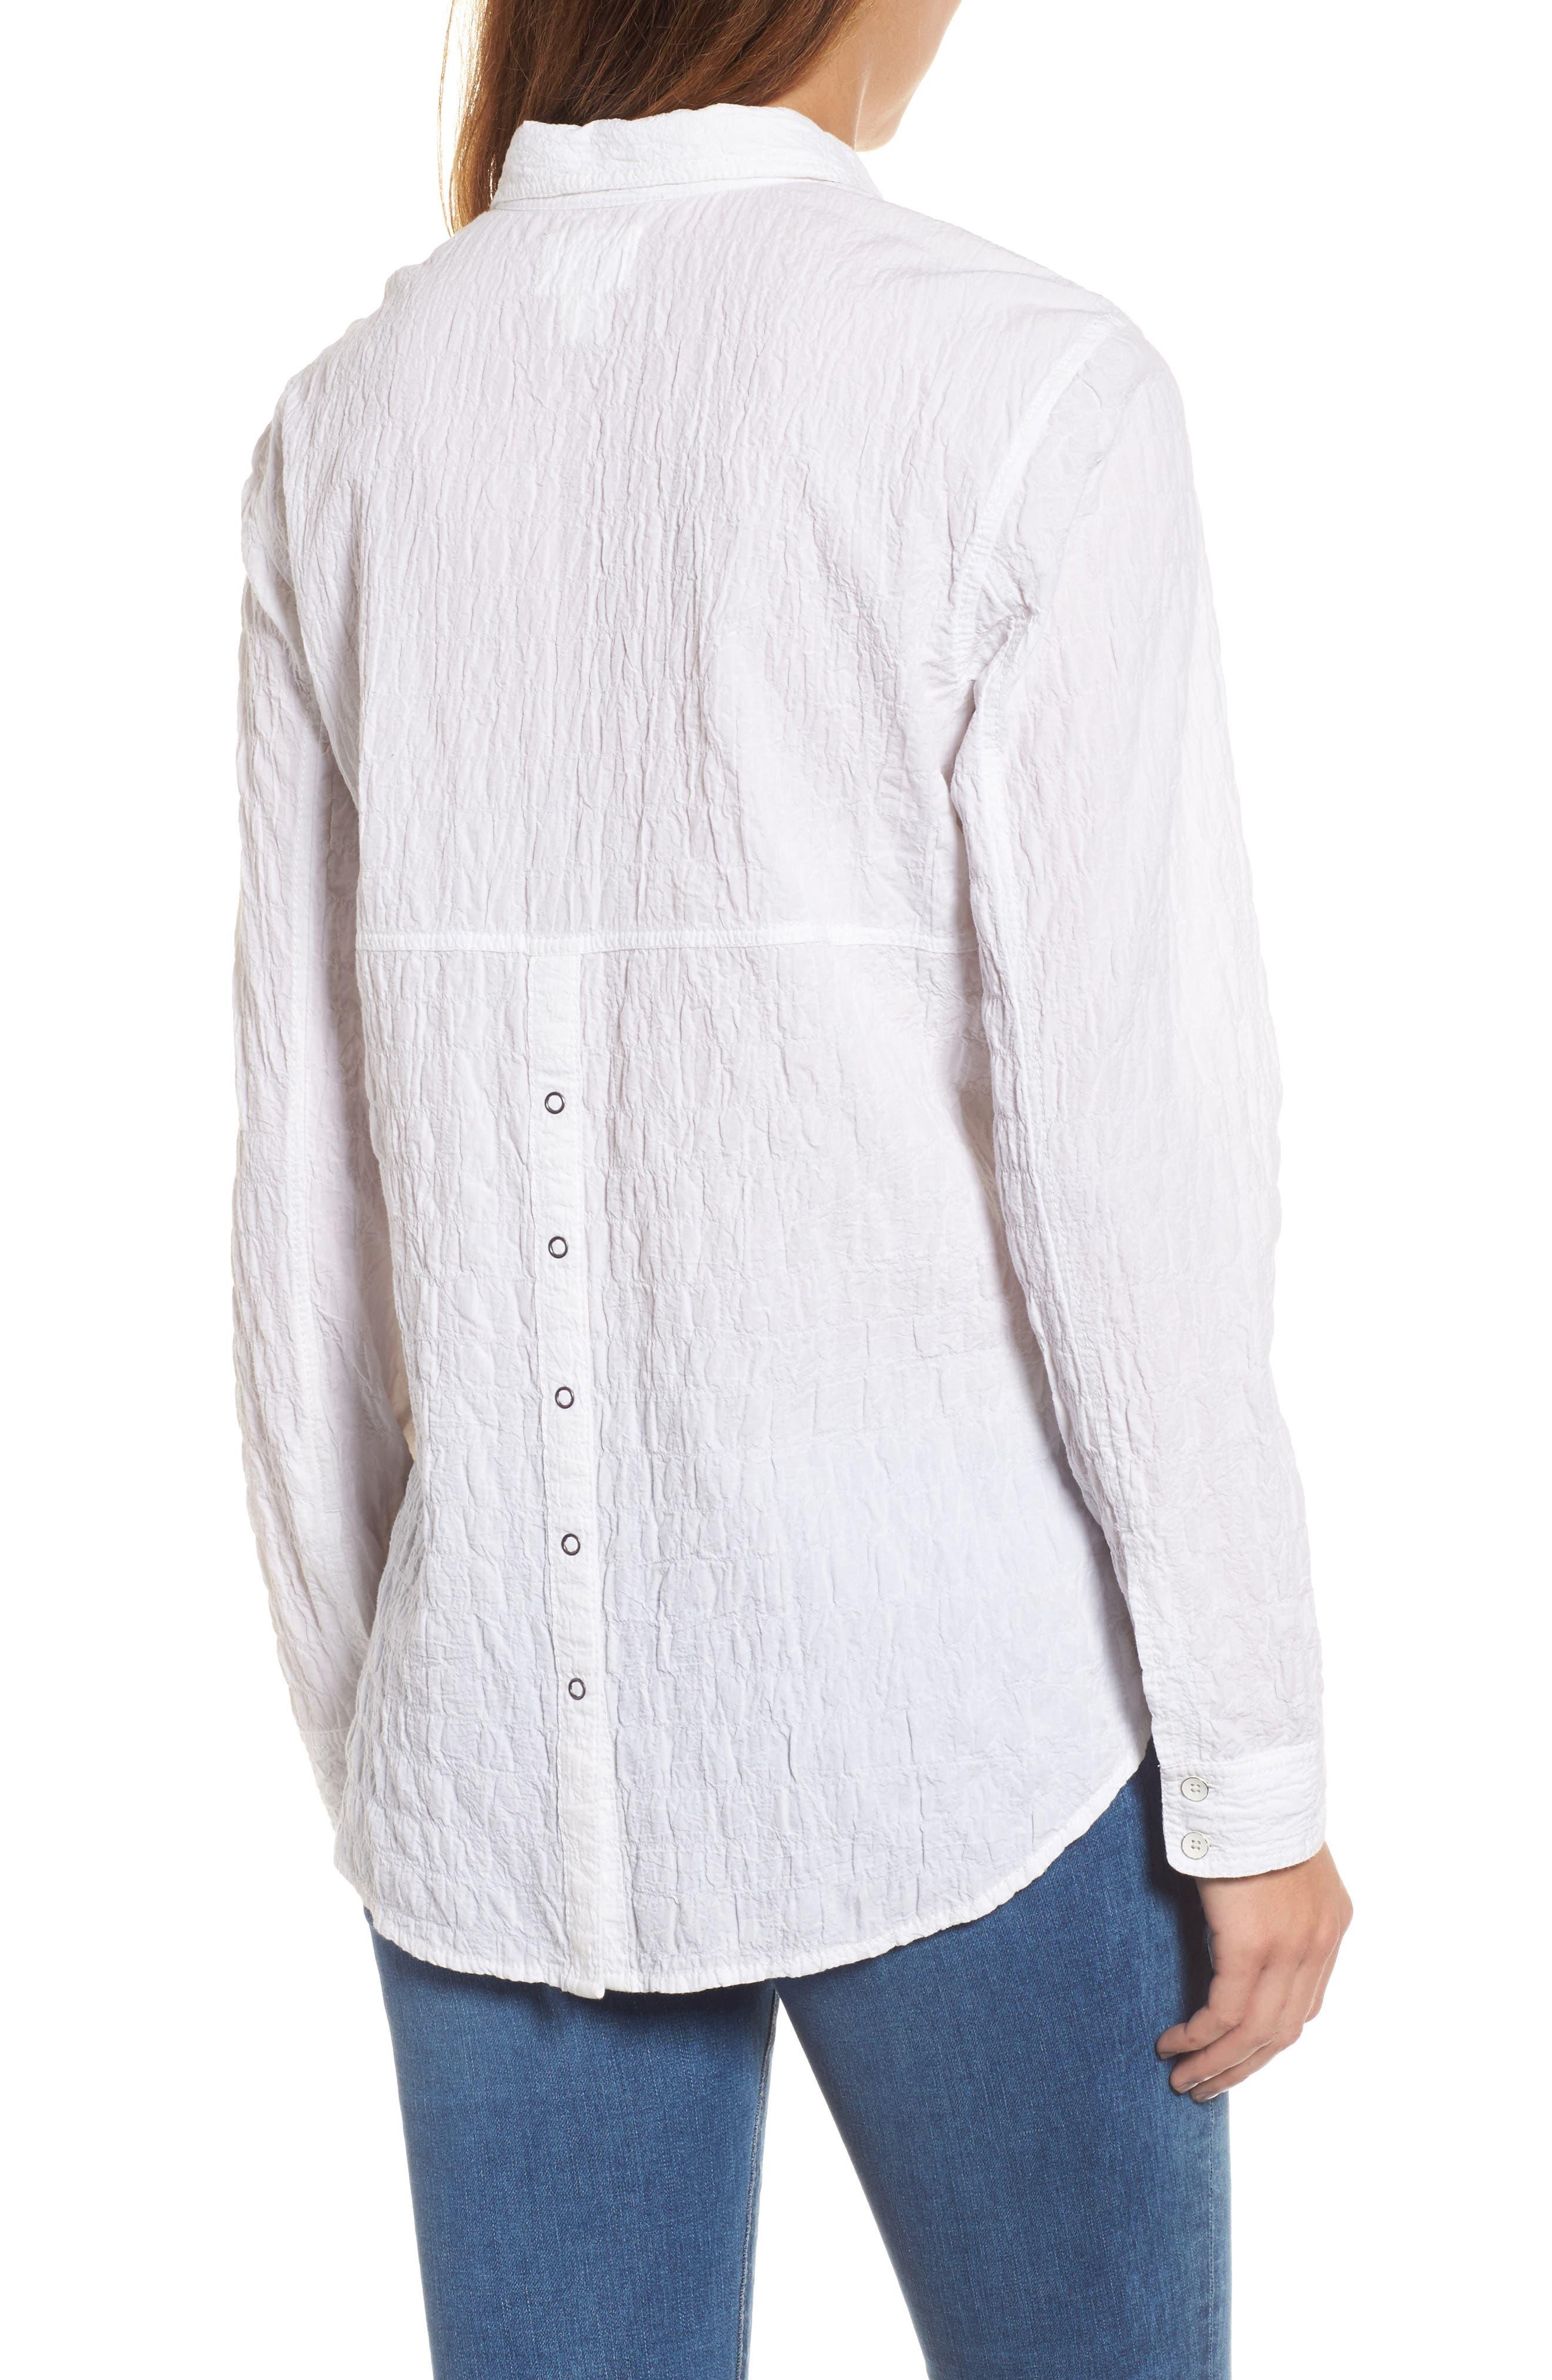 Button Up Shirt,                             Alternate thumbnail 2, color,                             White